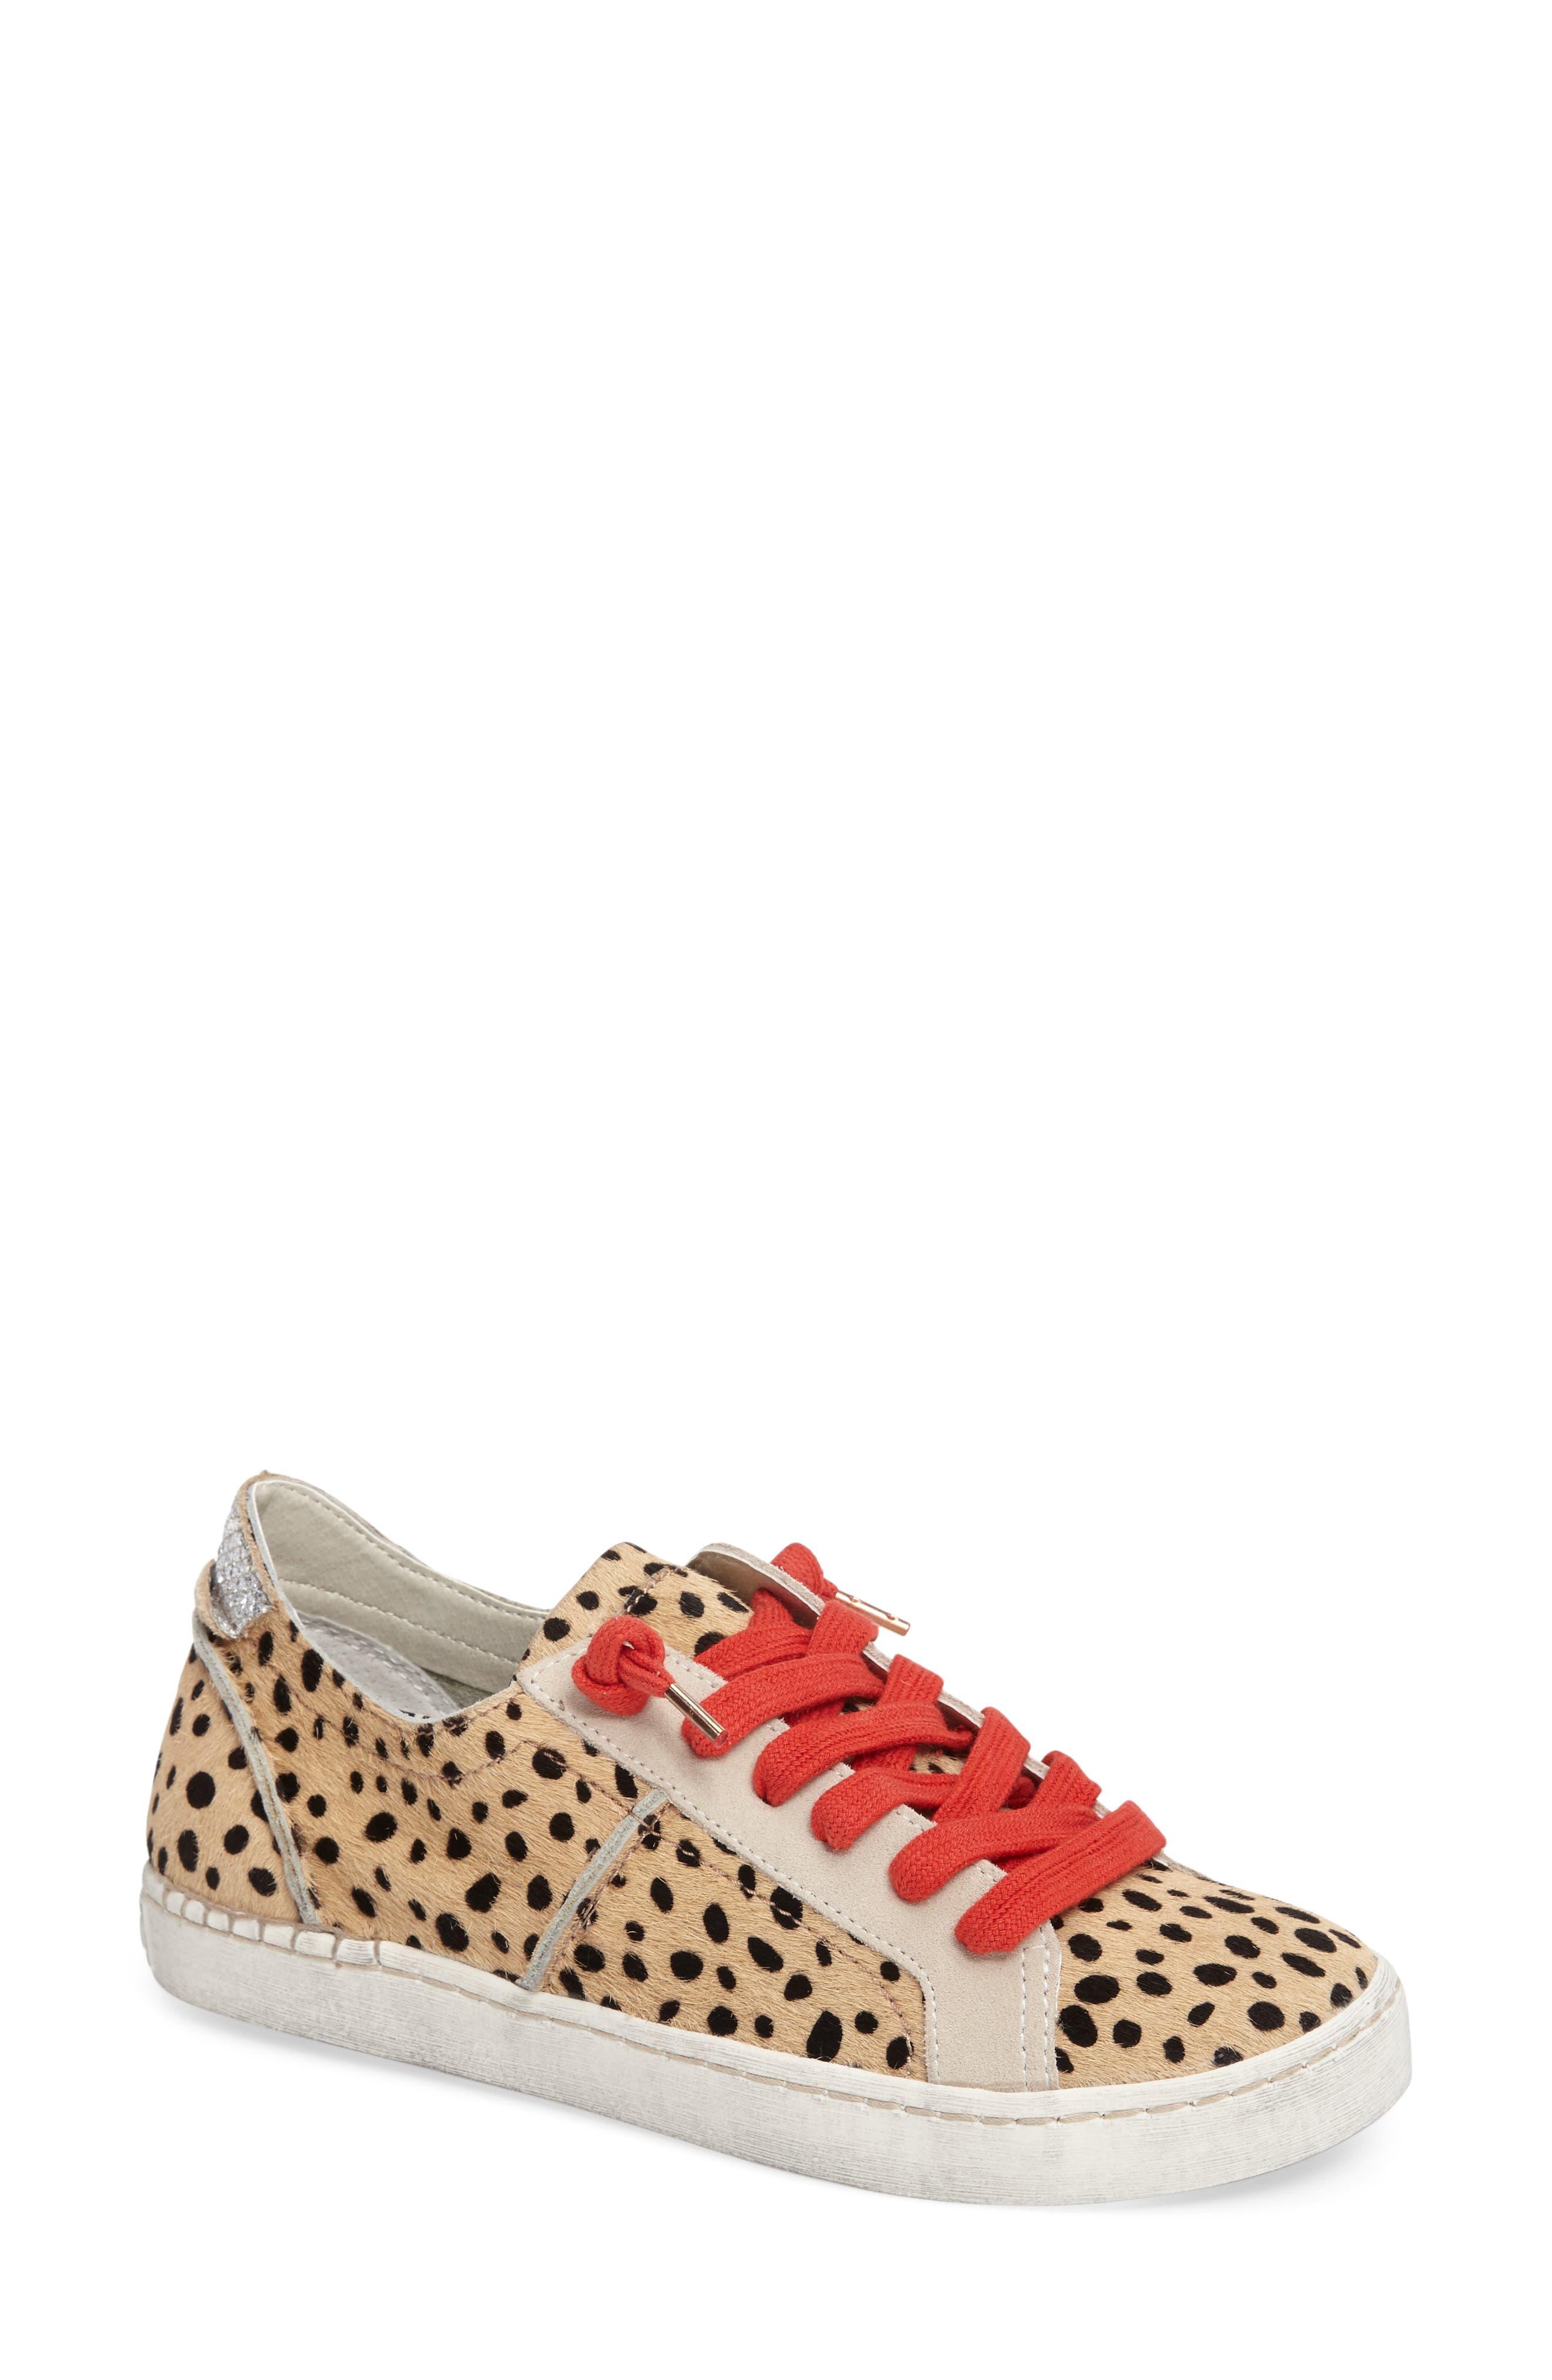 Main Image - Dolce Vita 'Zalen' Sneaker (Women)